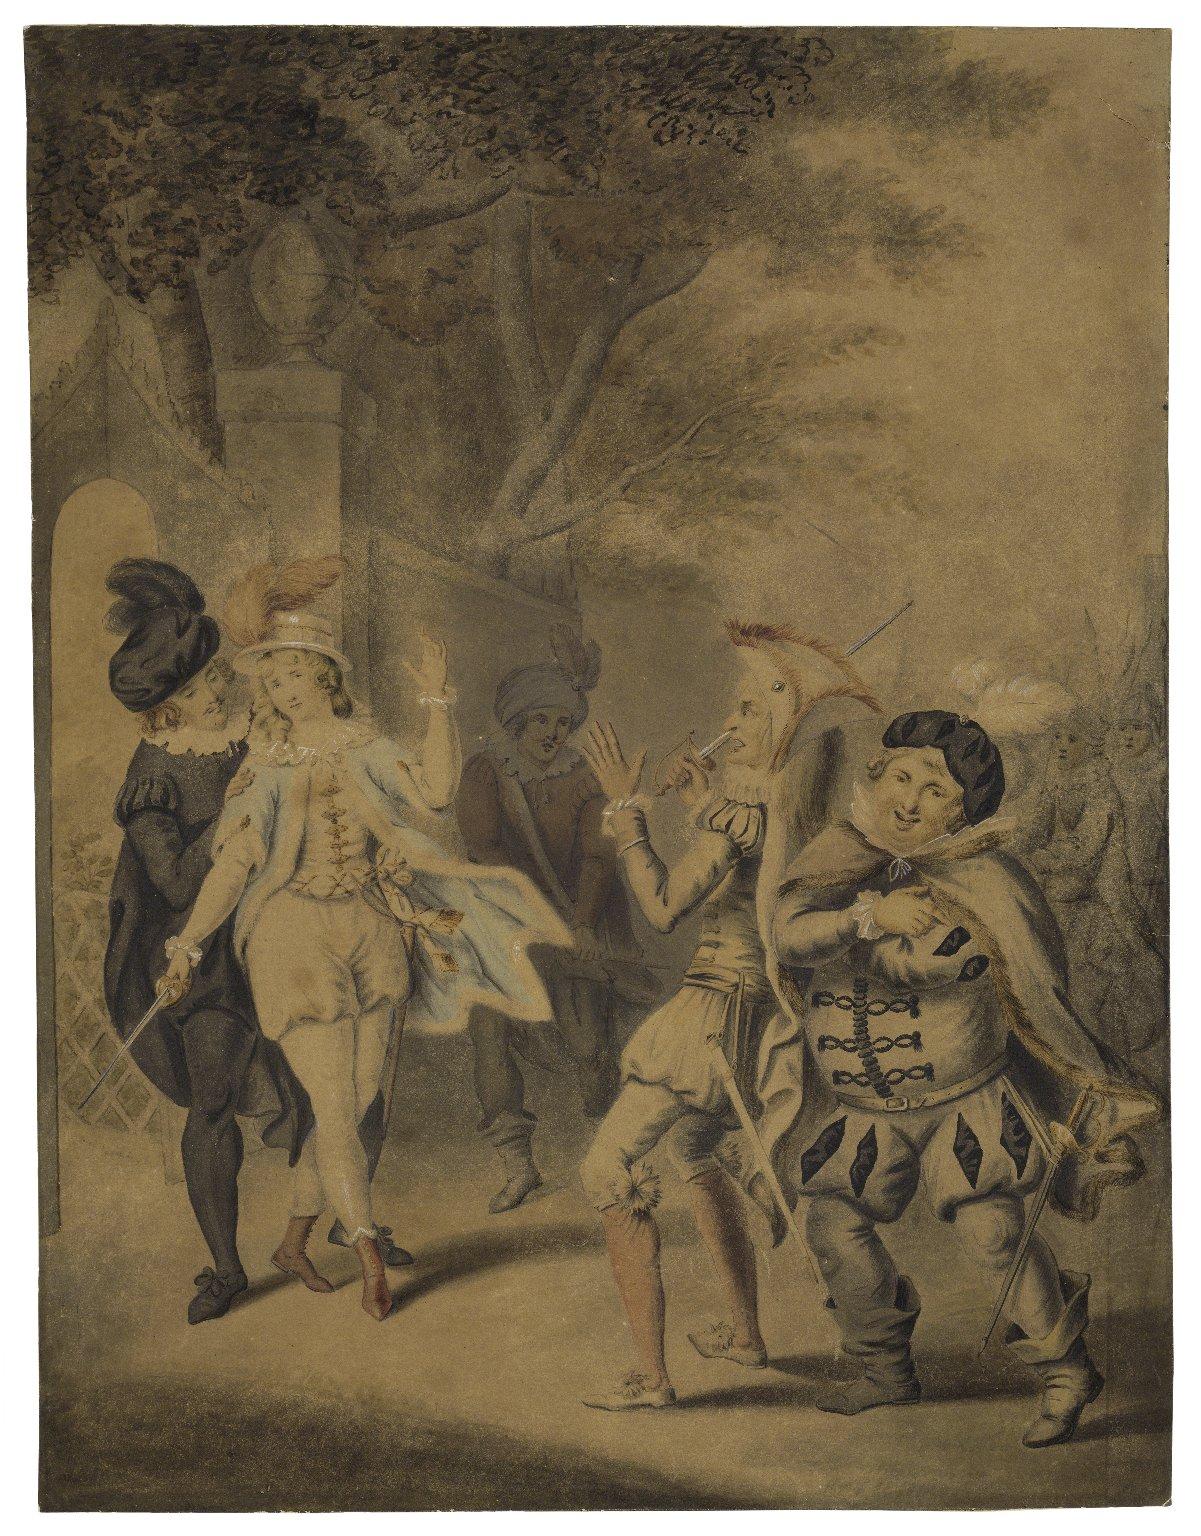 The duel between Viola and Sir Andrew Aguecheek in Twelfth night (act III, sc.4) [graphic] / [Henry William Bunbury?].